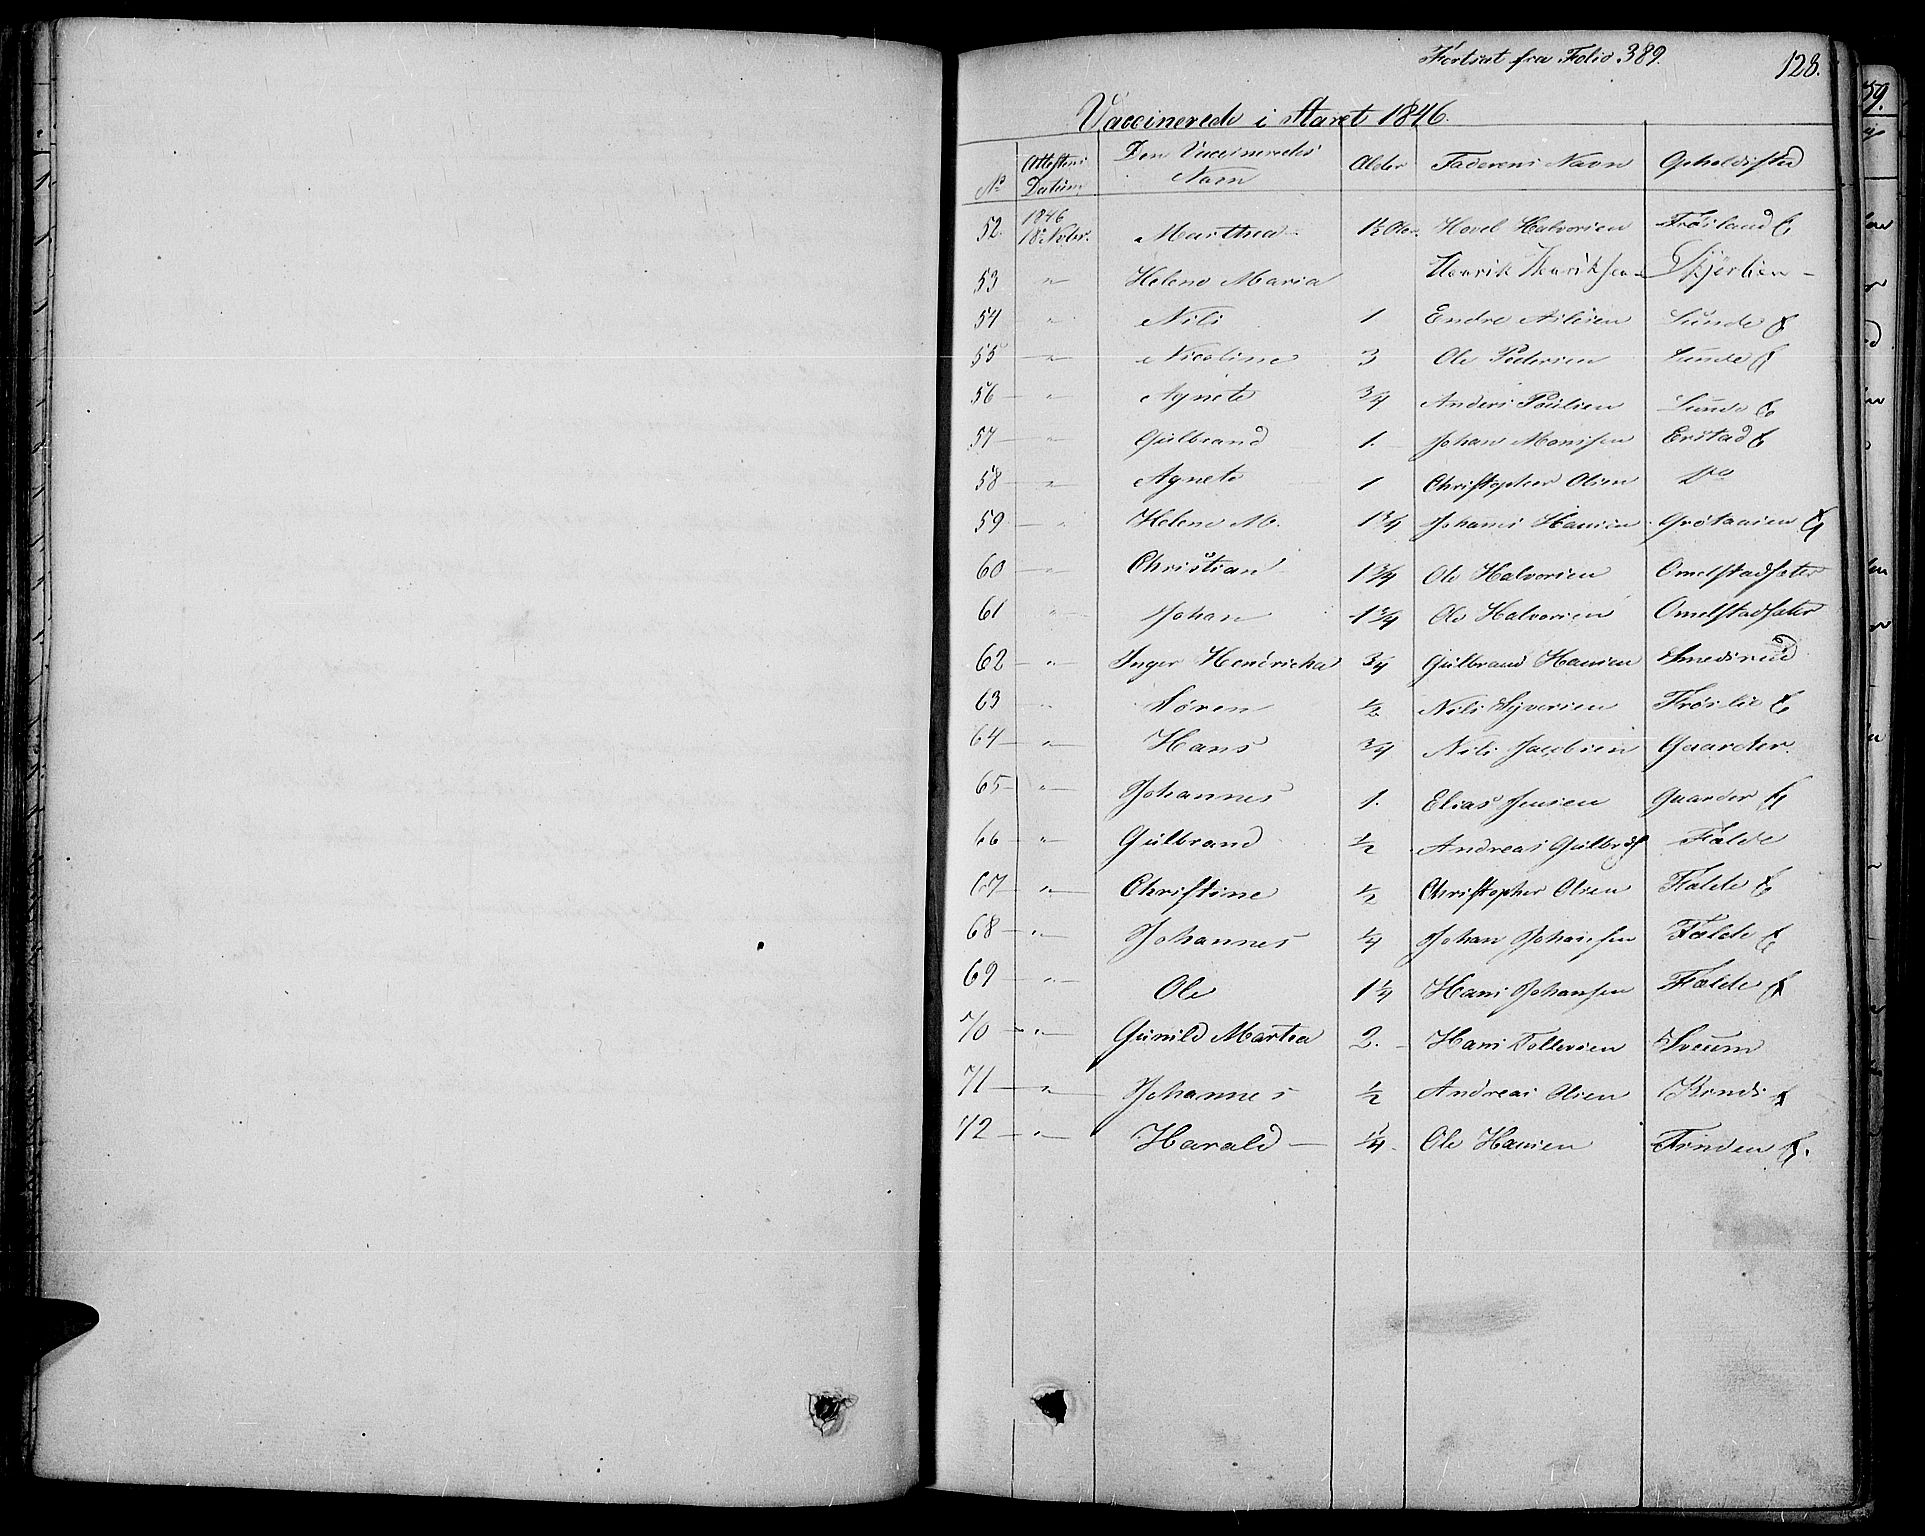 SAH, Land prestekontor, Ministerialbok nr. 8, 1830-1846, s. 128